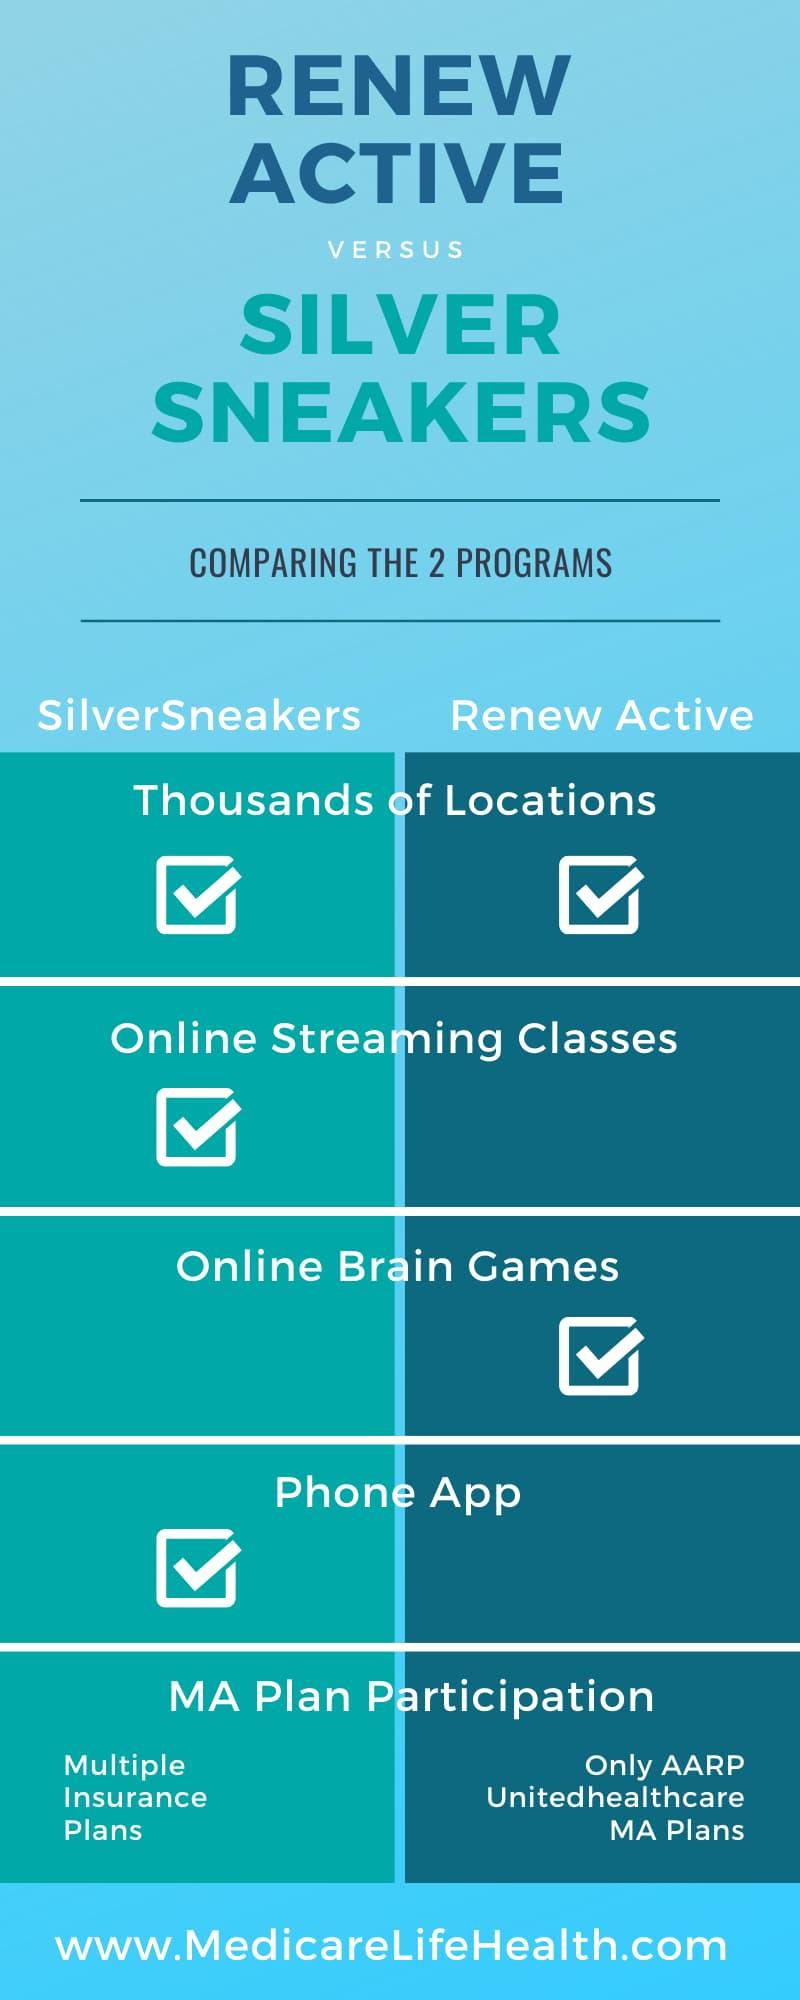 renew active vs silver sneakers infographic comparison chart